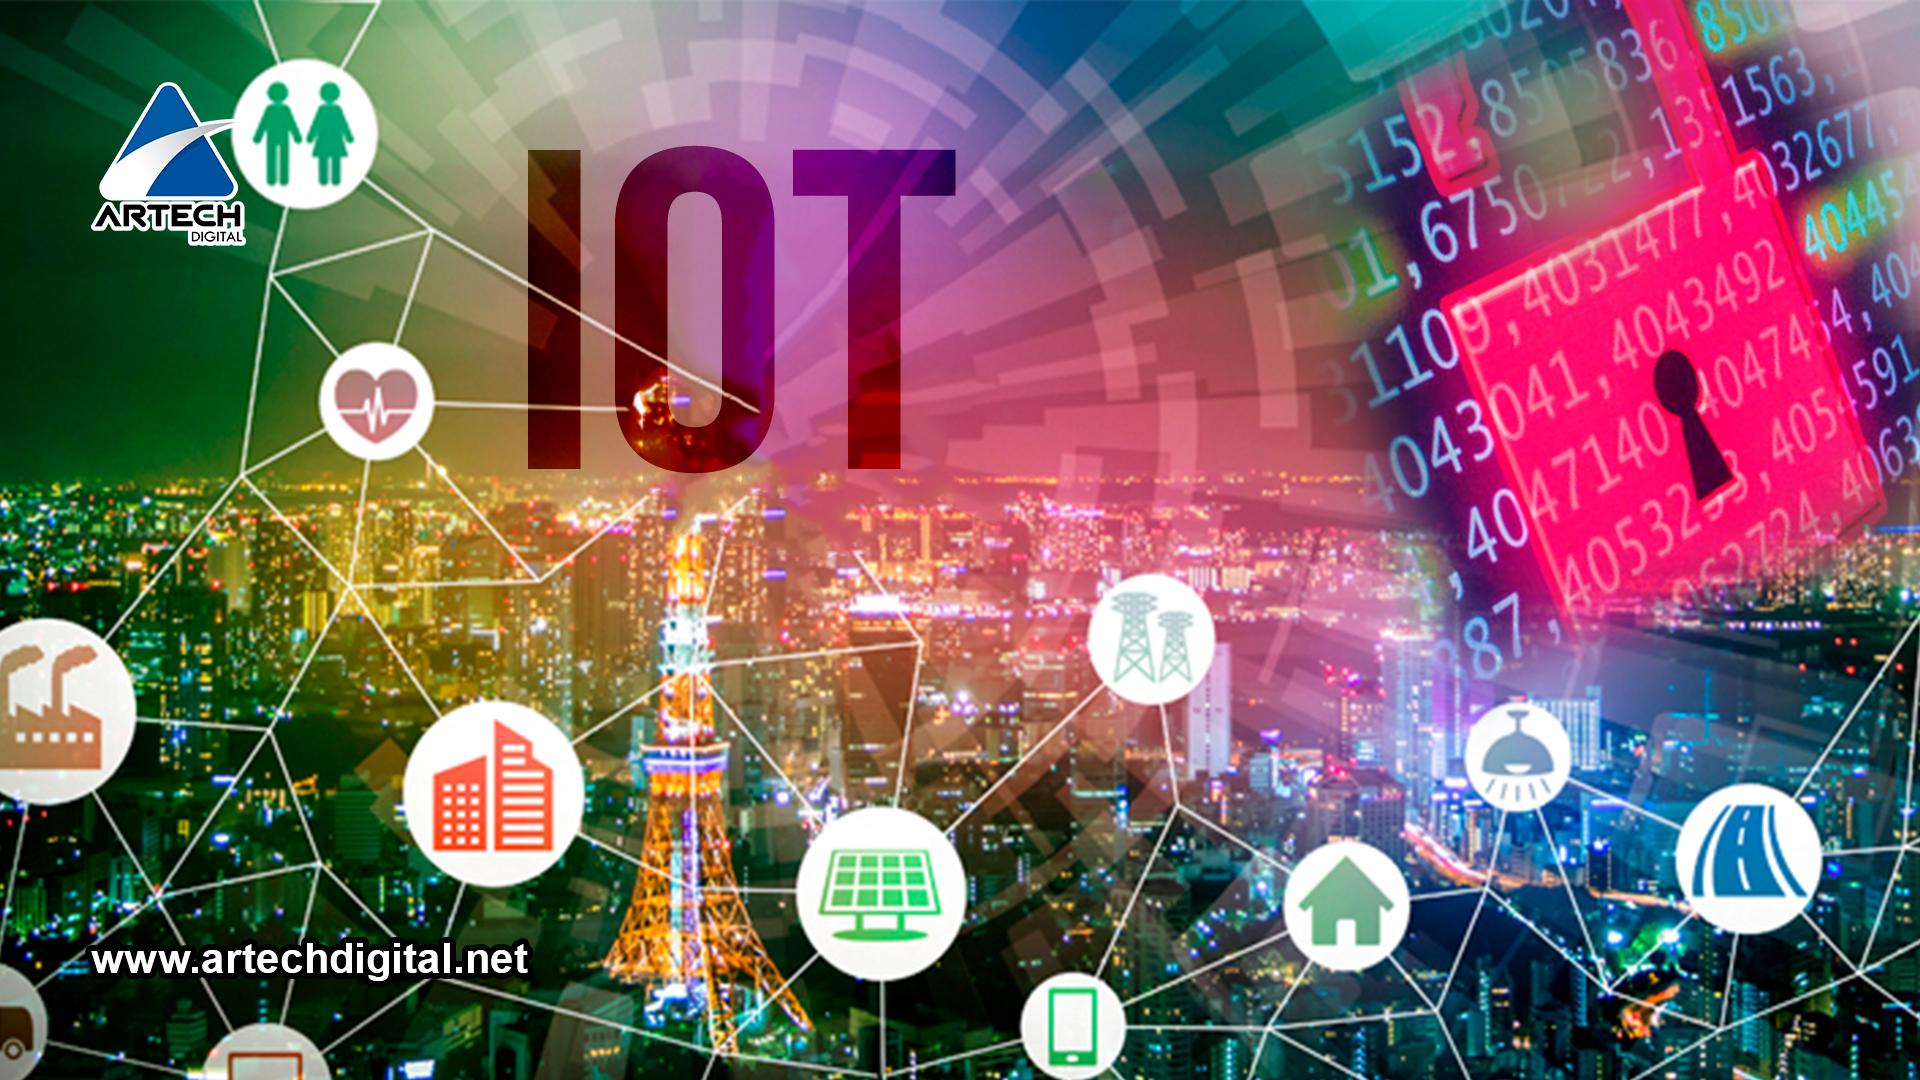 Sistema IoT - Malware - Artech Digital